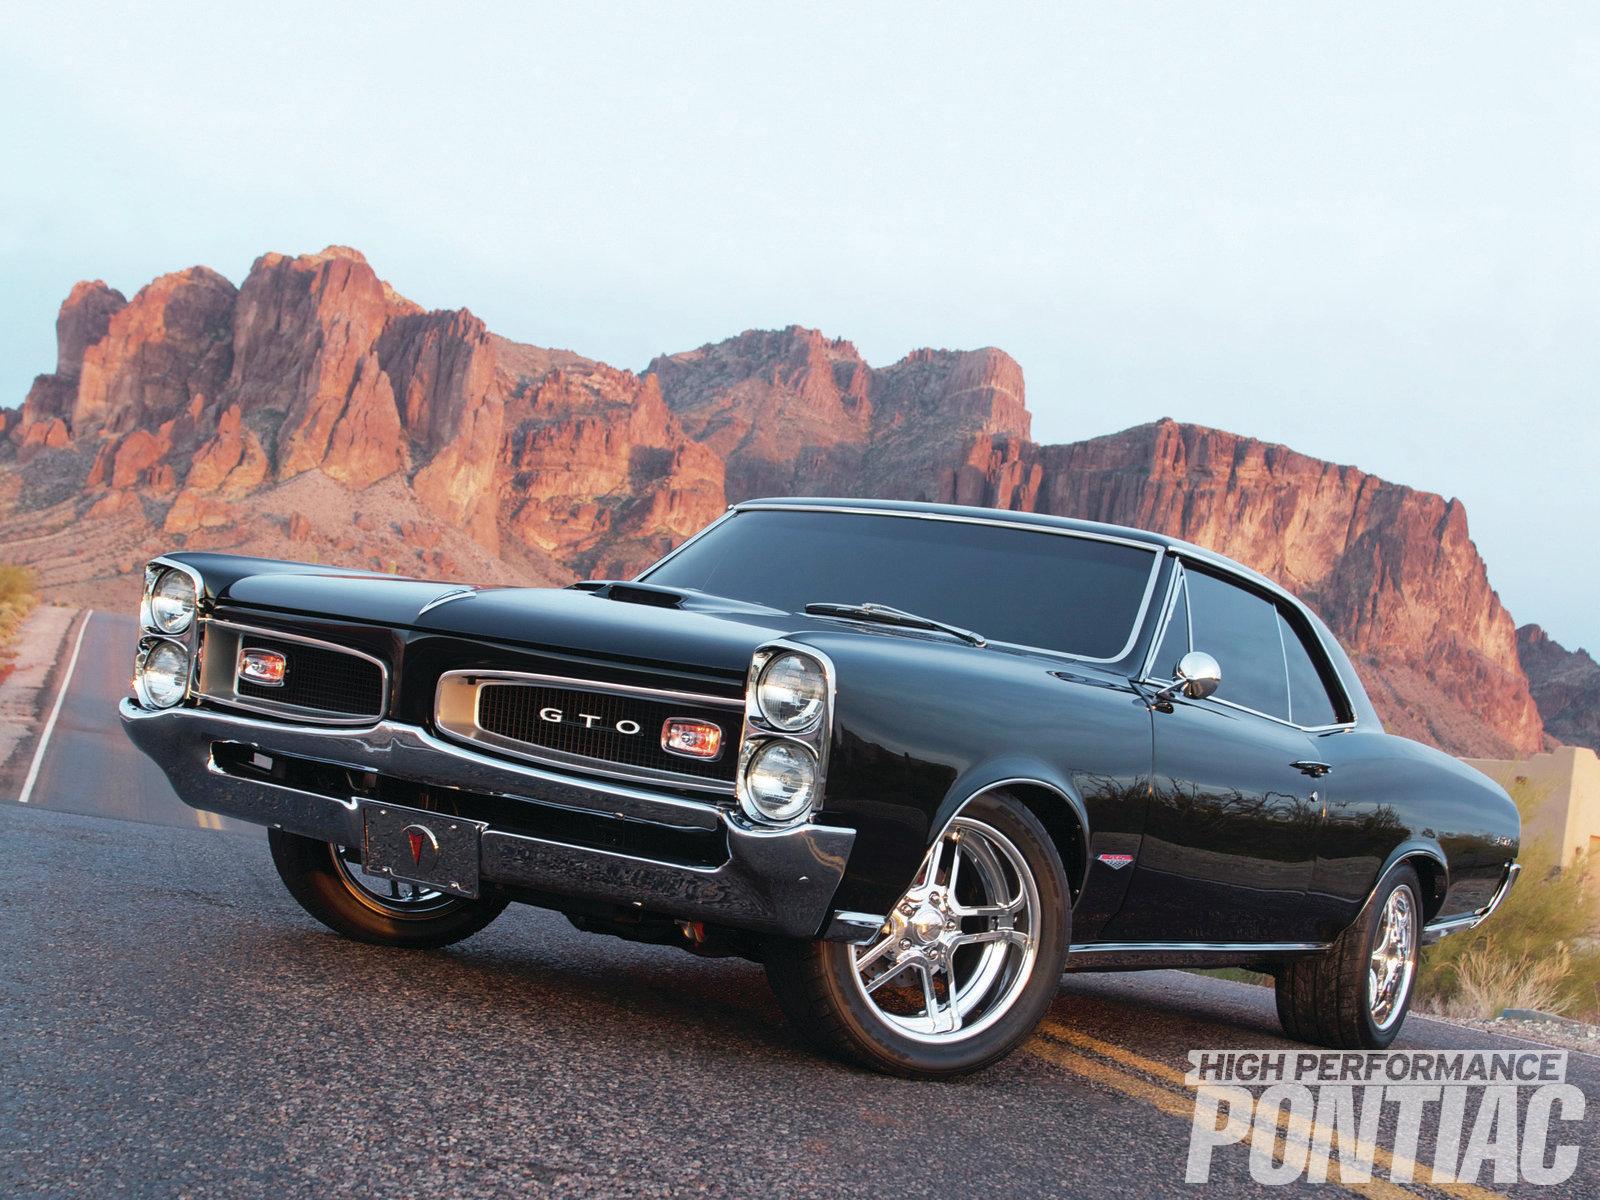 1966 Pontiac Gto Front View 1600x1200